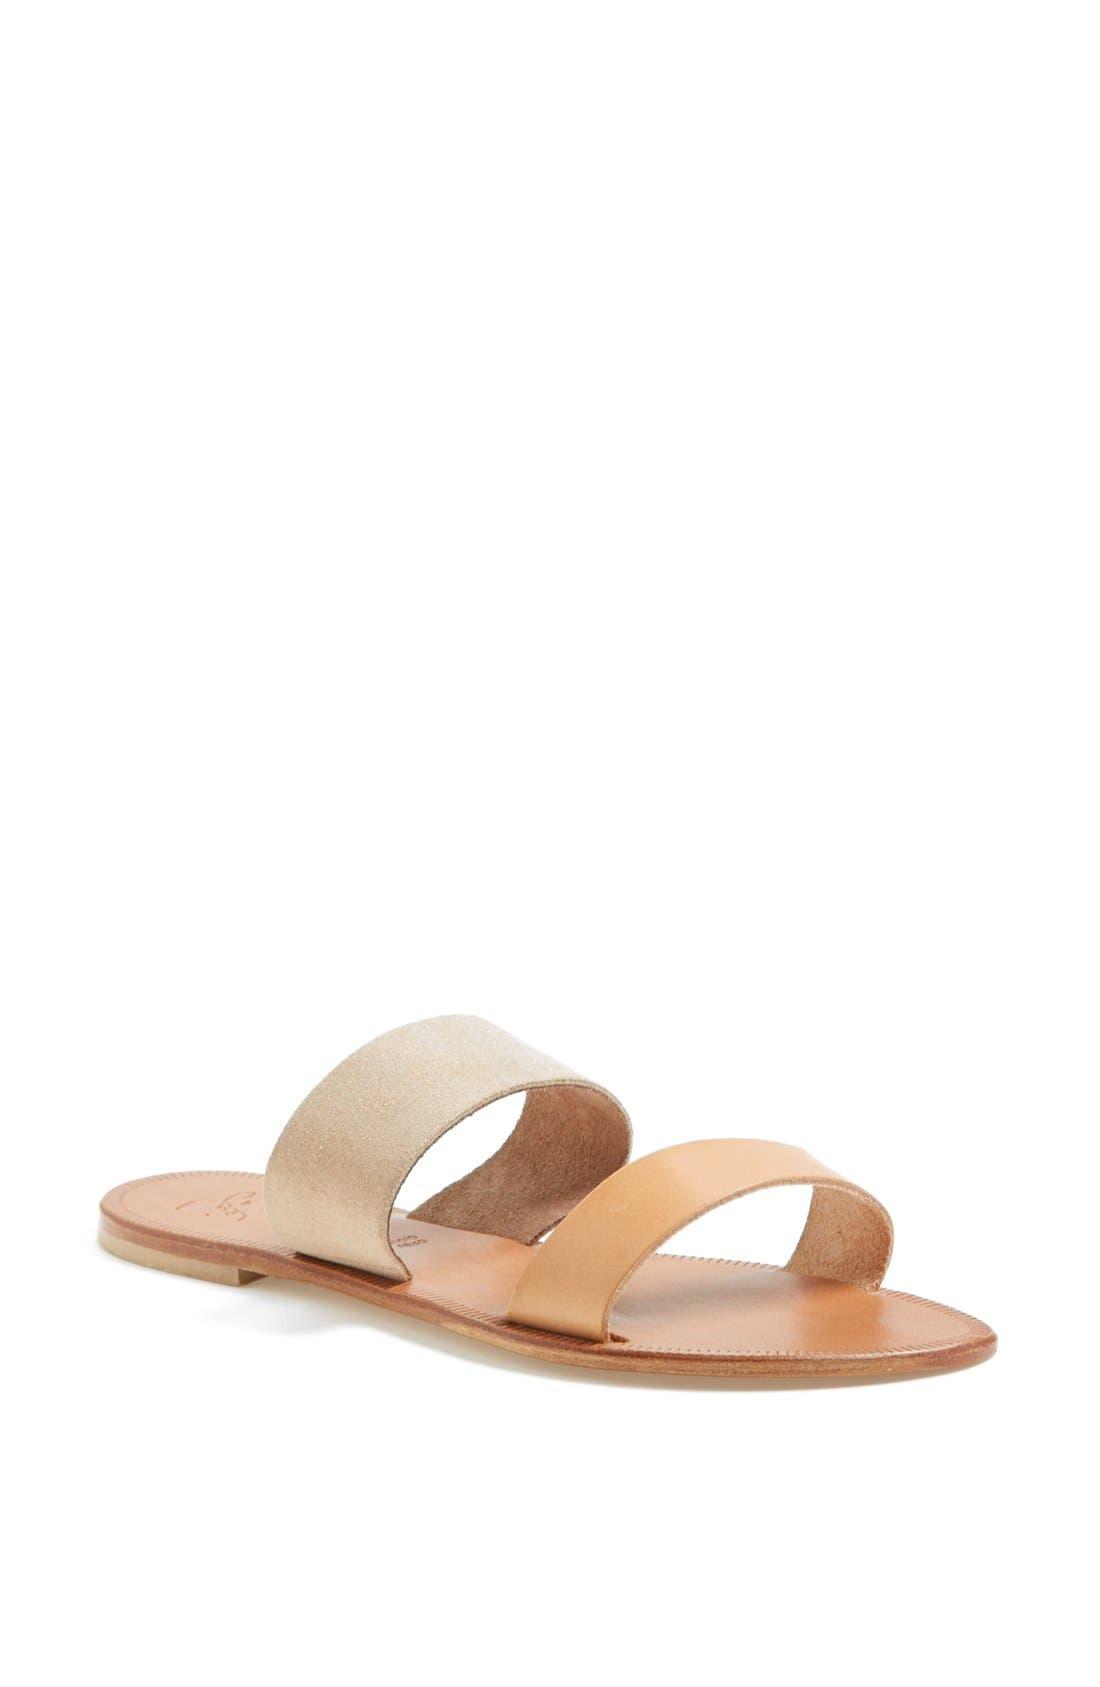 Alternate Image 1 Selected - Joie a la Plage 'Sable' Leather Slip-On Sandal (Women)